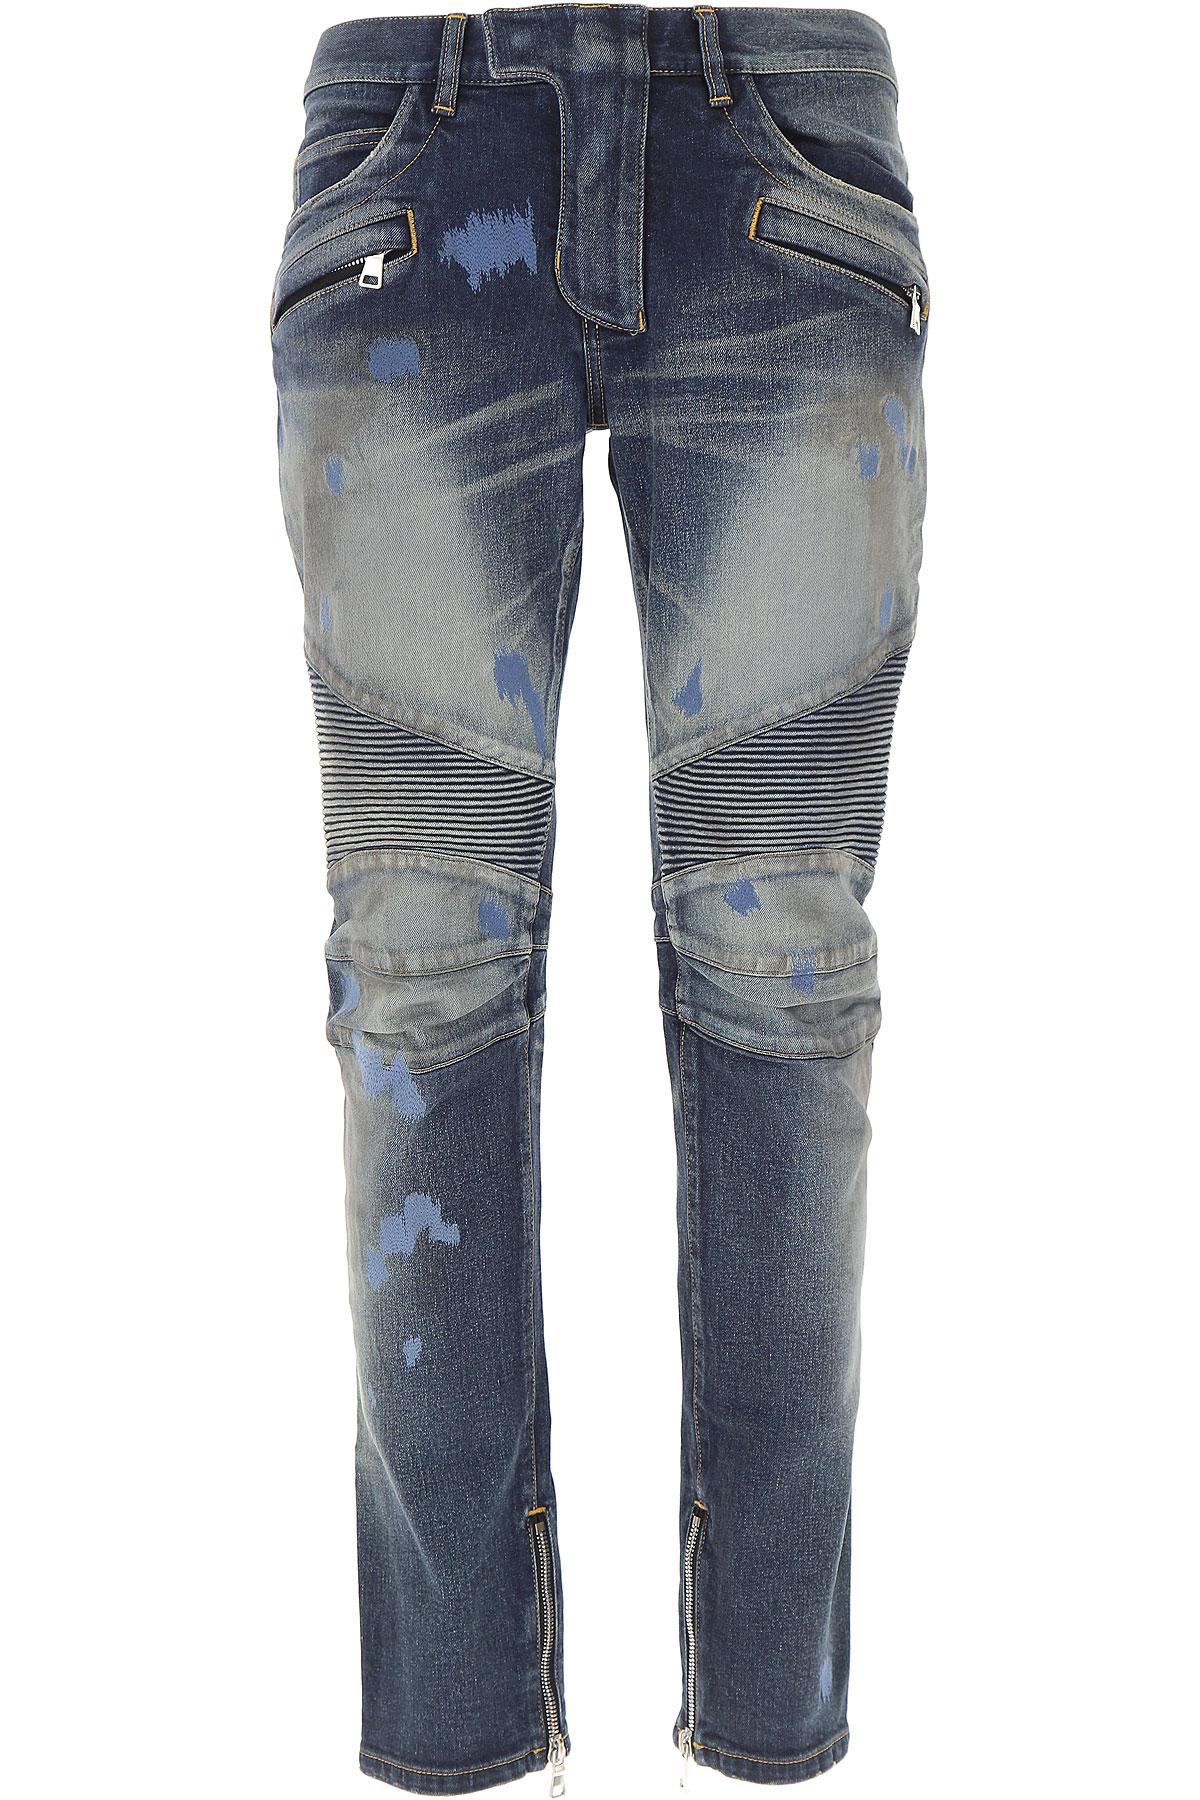 Balmain Jeans, Denim, Cotton, 2017, 32 34 36 USA-476616